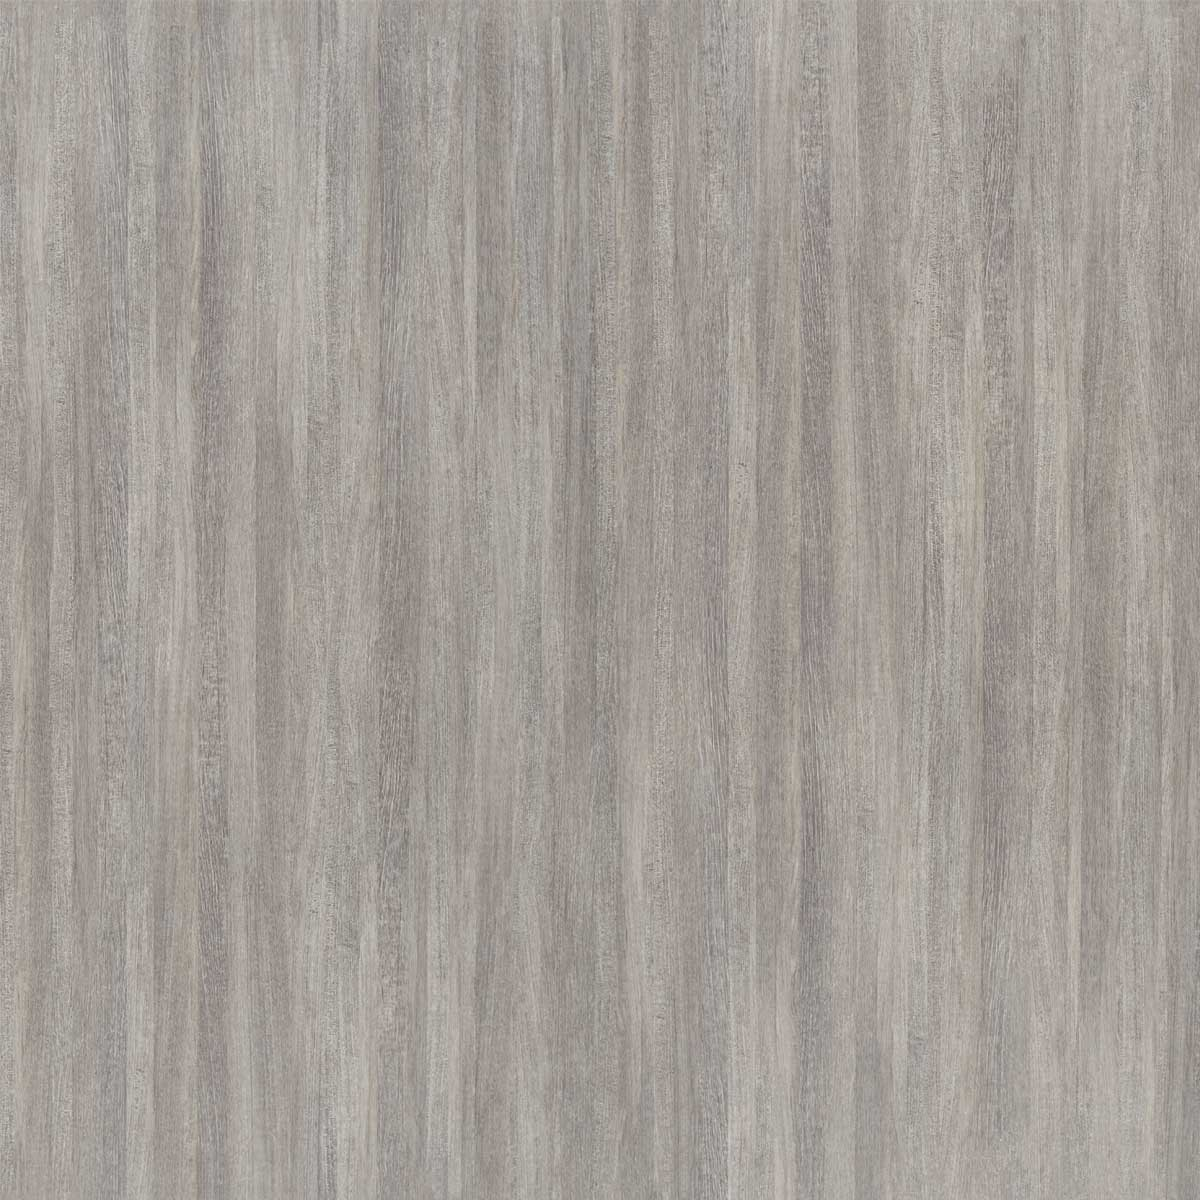 formica flooring weathered fiberwood ZXUPVPO